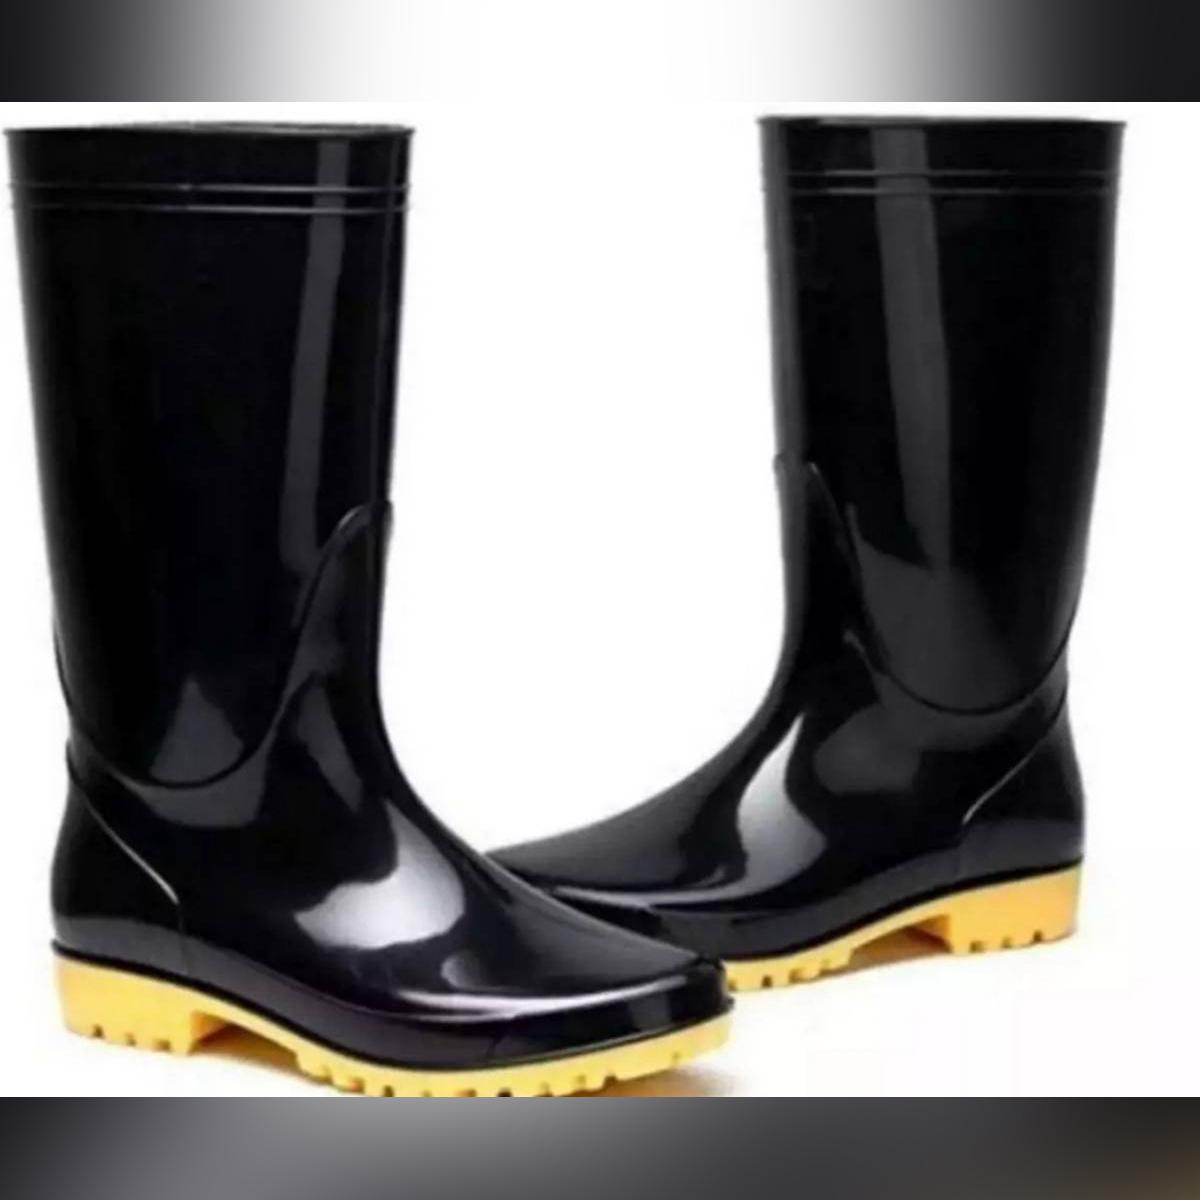 WATERPROOF LONG HEIGHT ONE PAIR BLACK RUBBER RAIN BOOT FOR MEN&&WOMEN